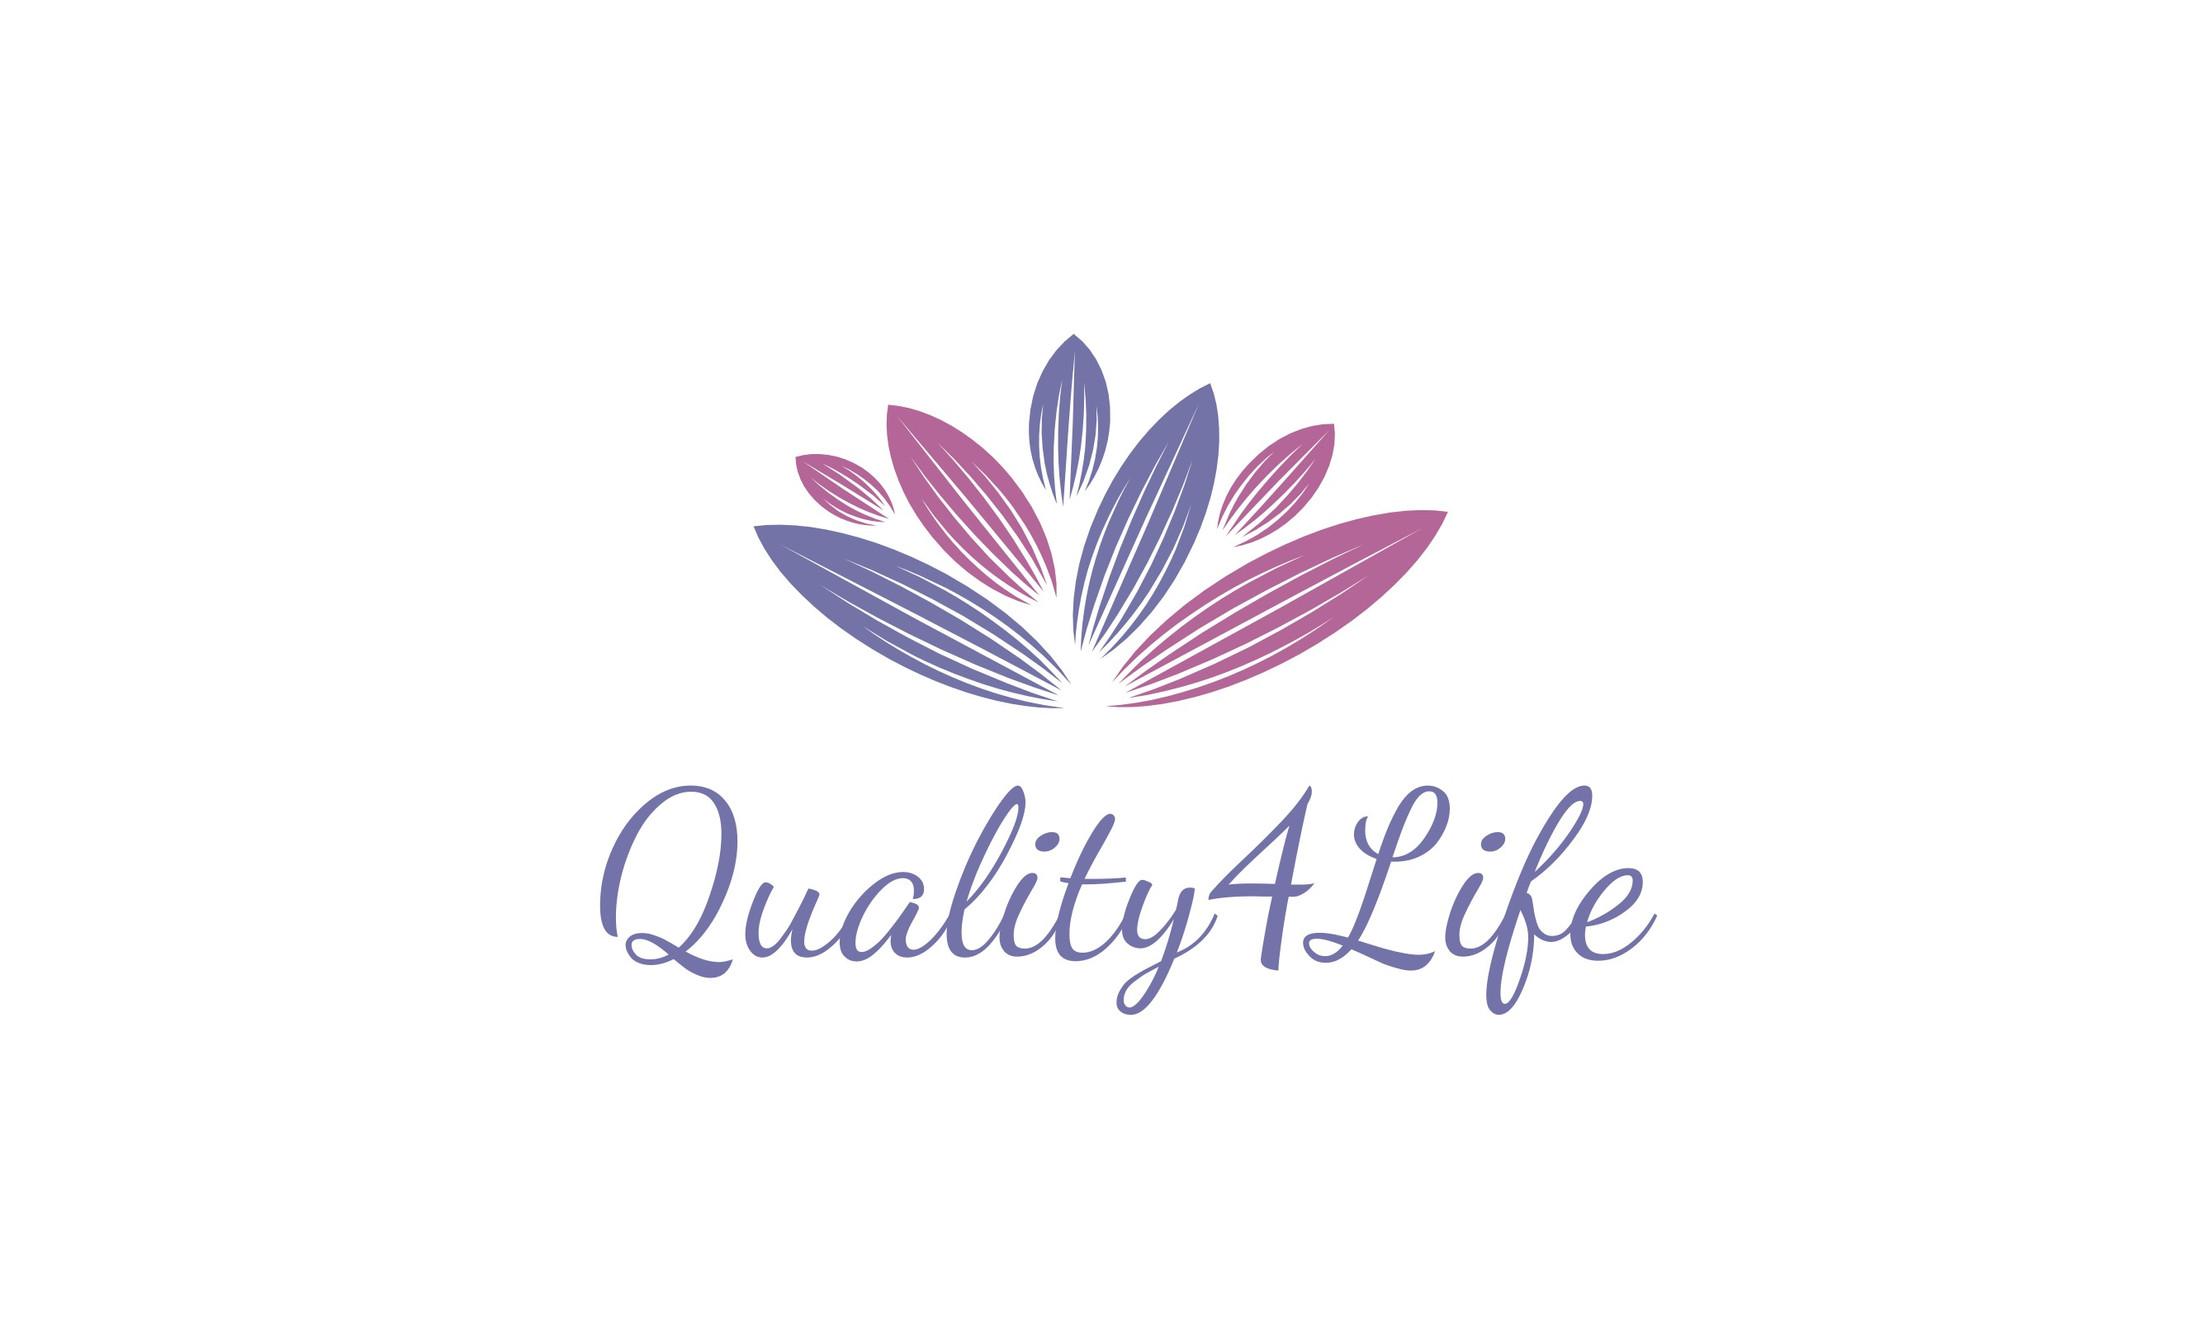 Quantum-magnetic-resonance | United Kingdom | Quality 4 Life